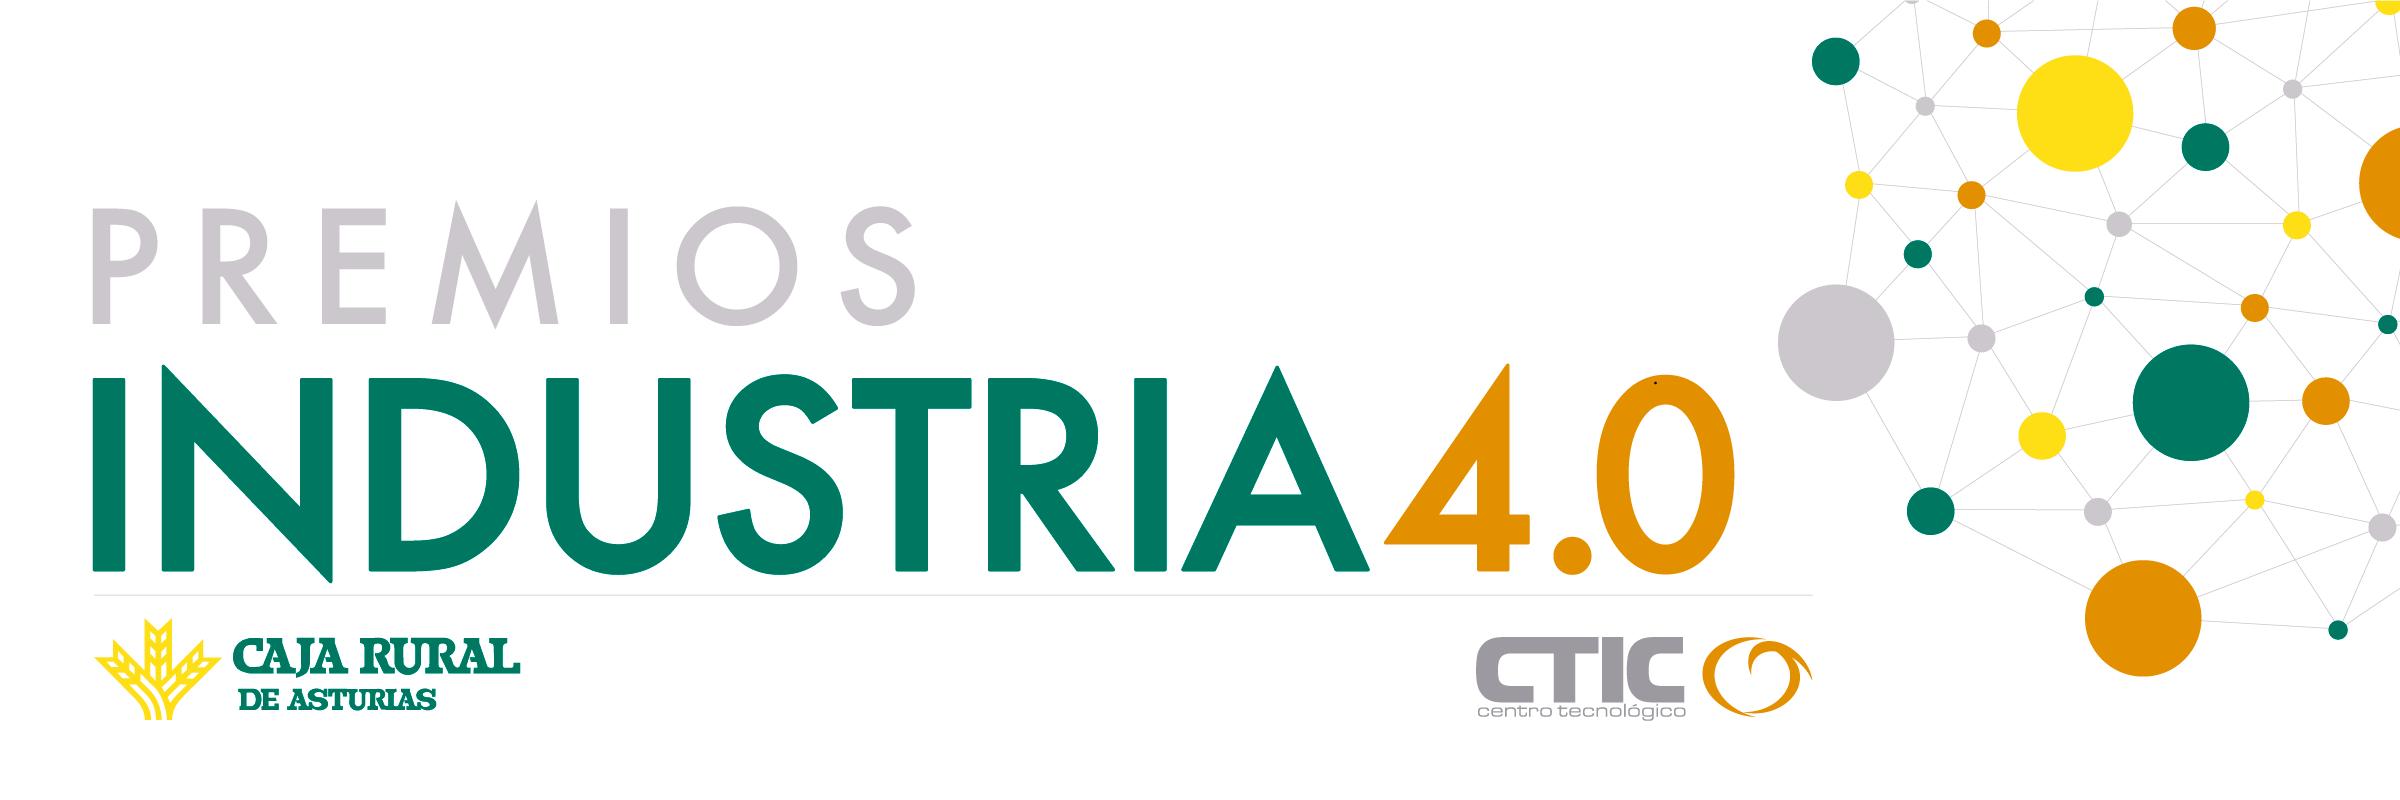 Premios Industria 4.0 - 2019